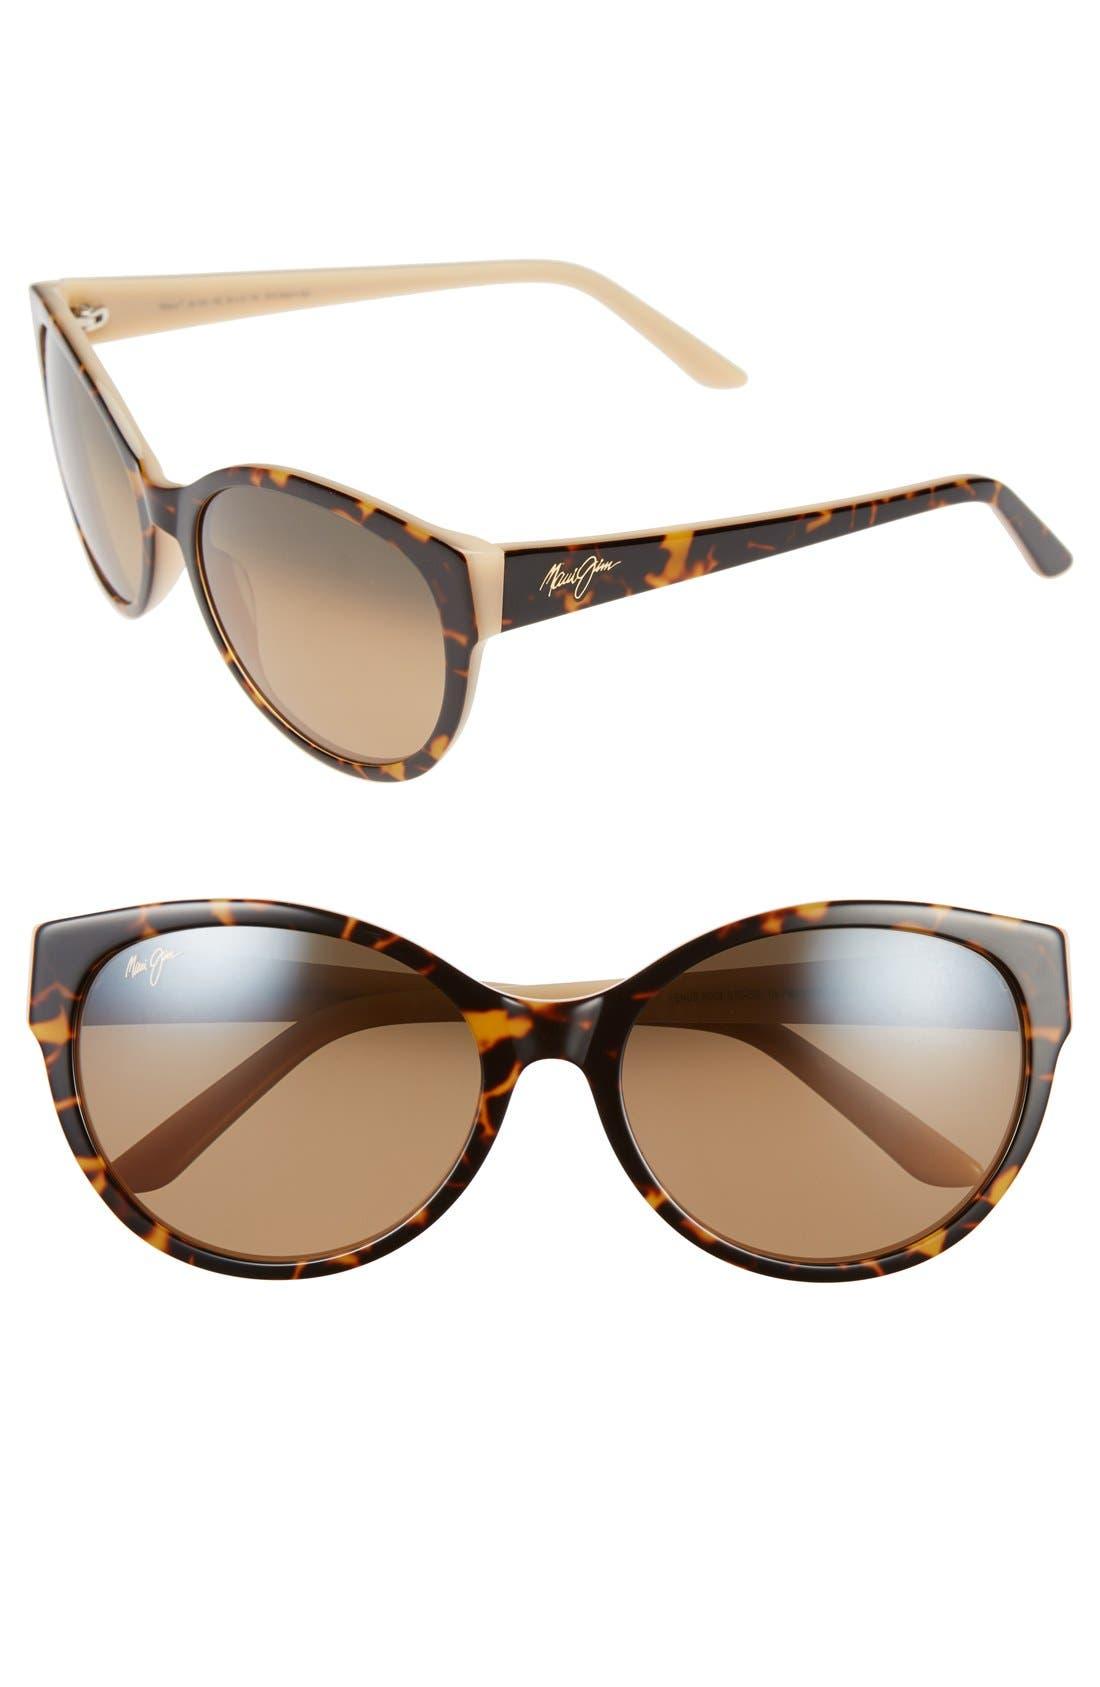 Maui Jim 58mm PolarizedPlus® Sunglasses